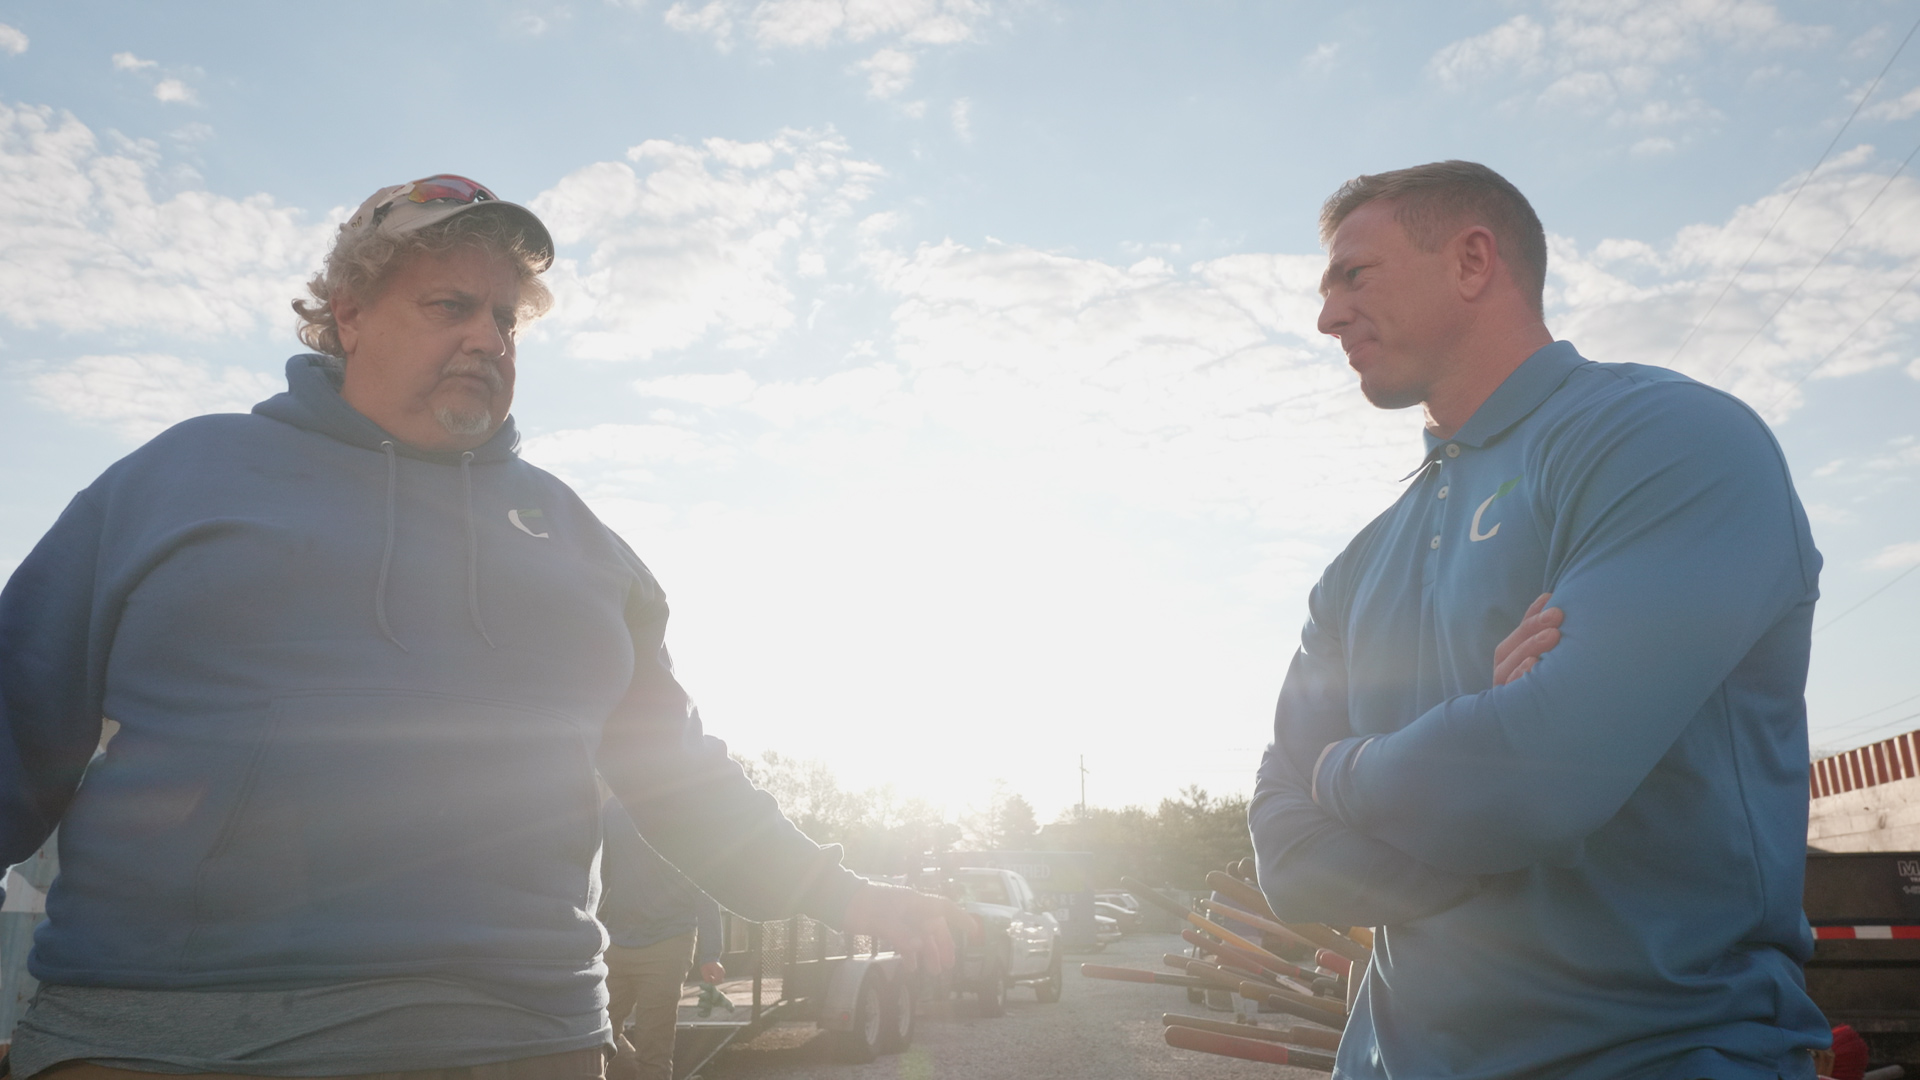 Matt Howe and Jim Keller